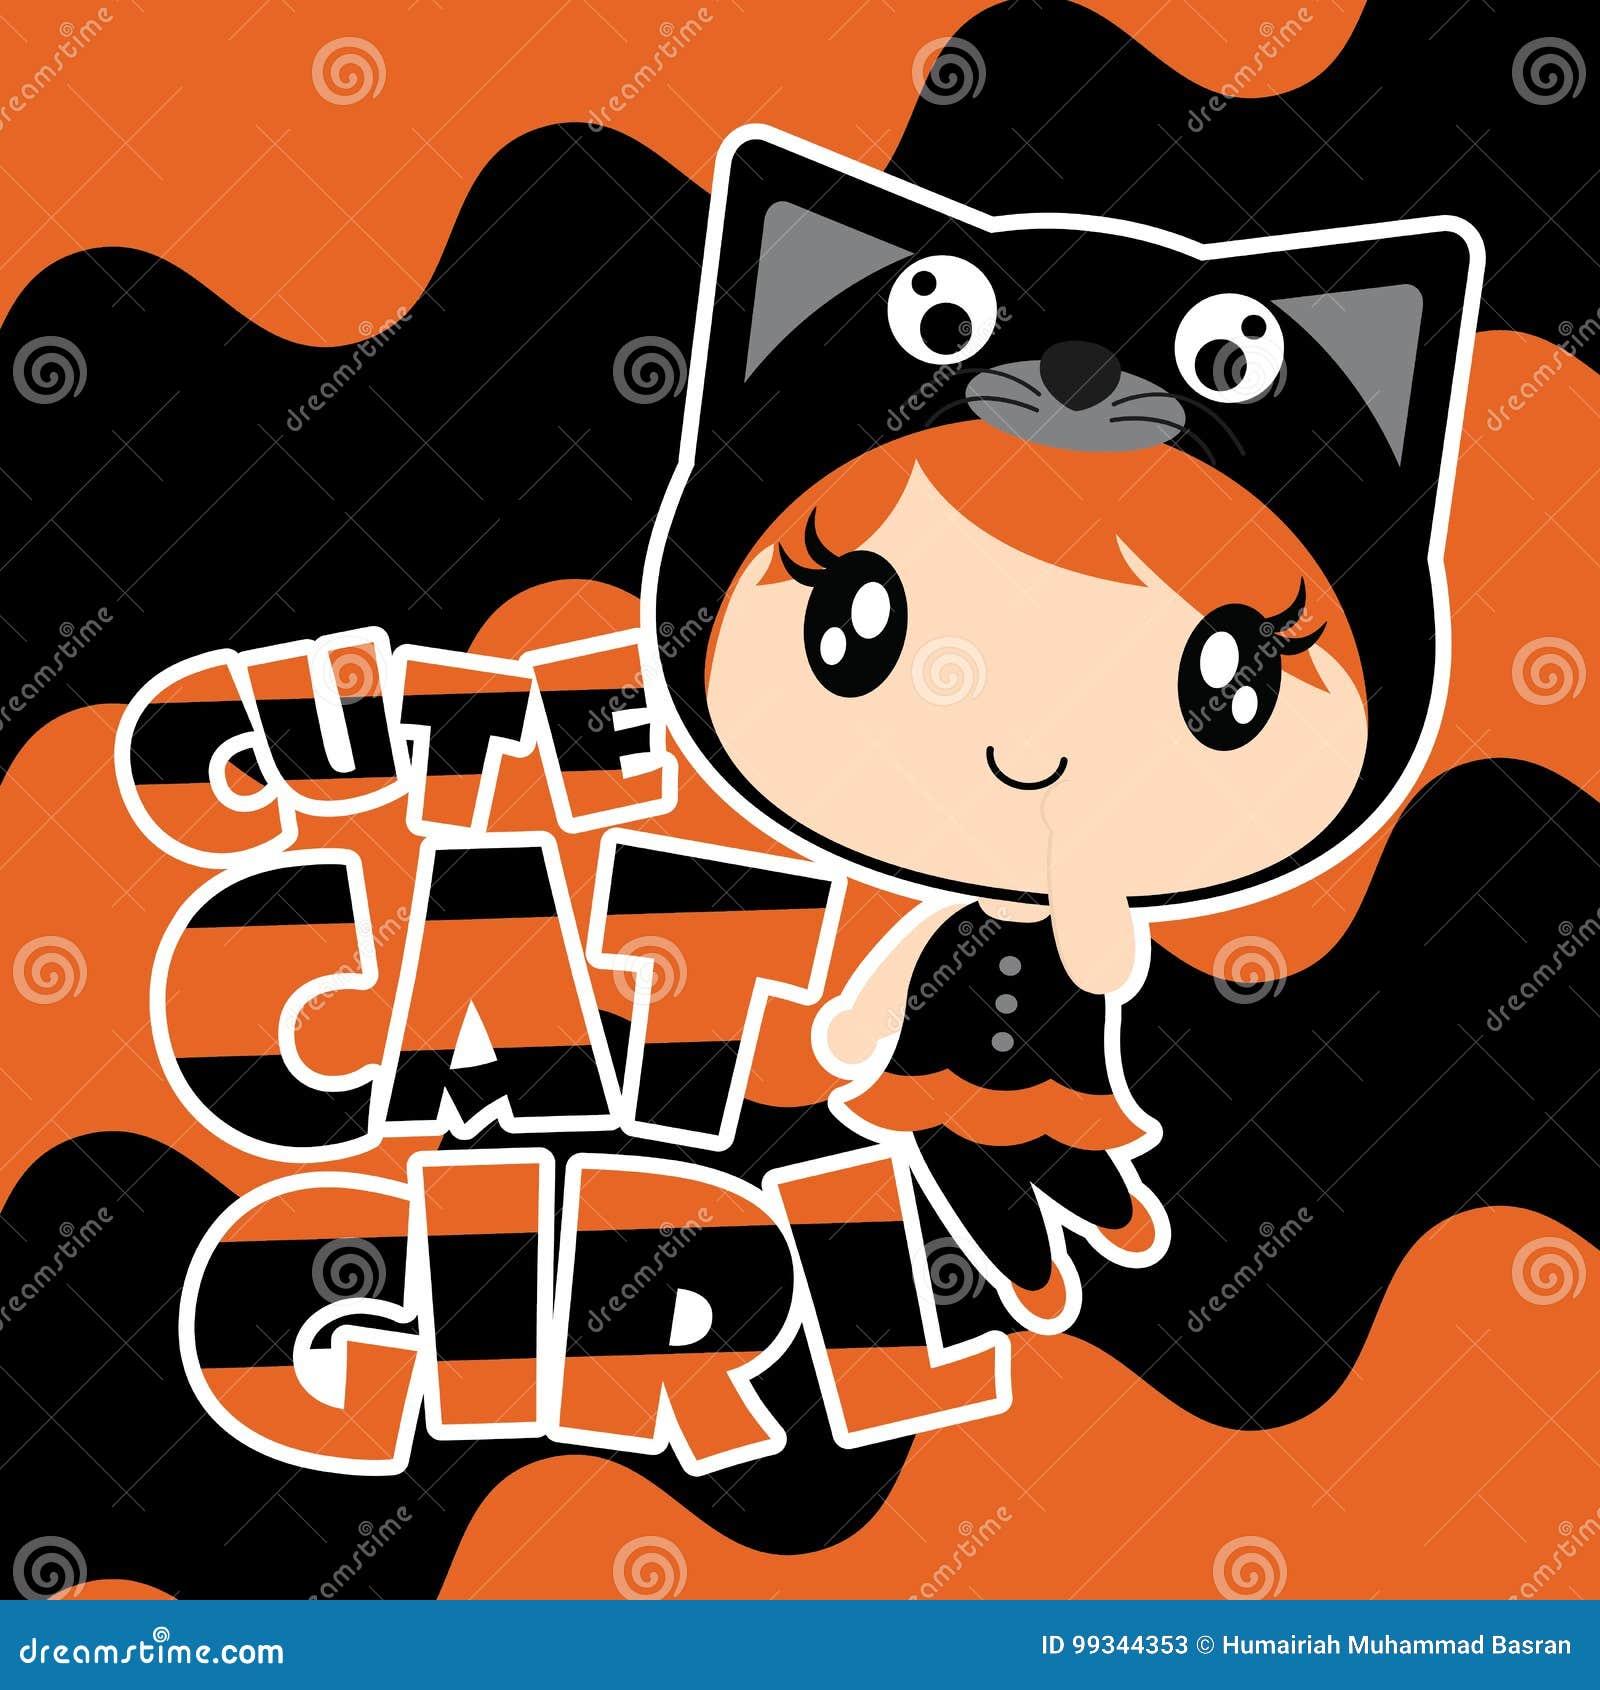 Cute Black Cat Girl On Wave Background Cartoon Illustration For Halloween Card Design Stock Vector Illustration Of Party Celebration 99344353